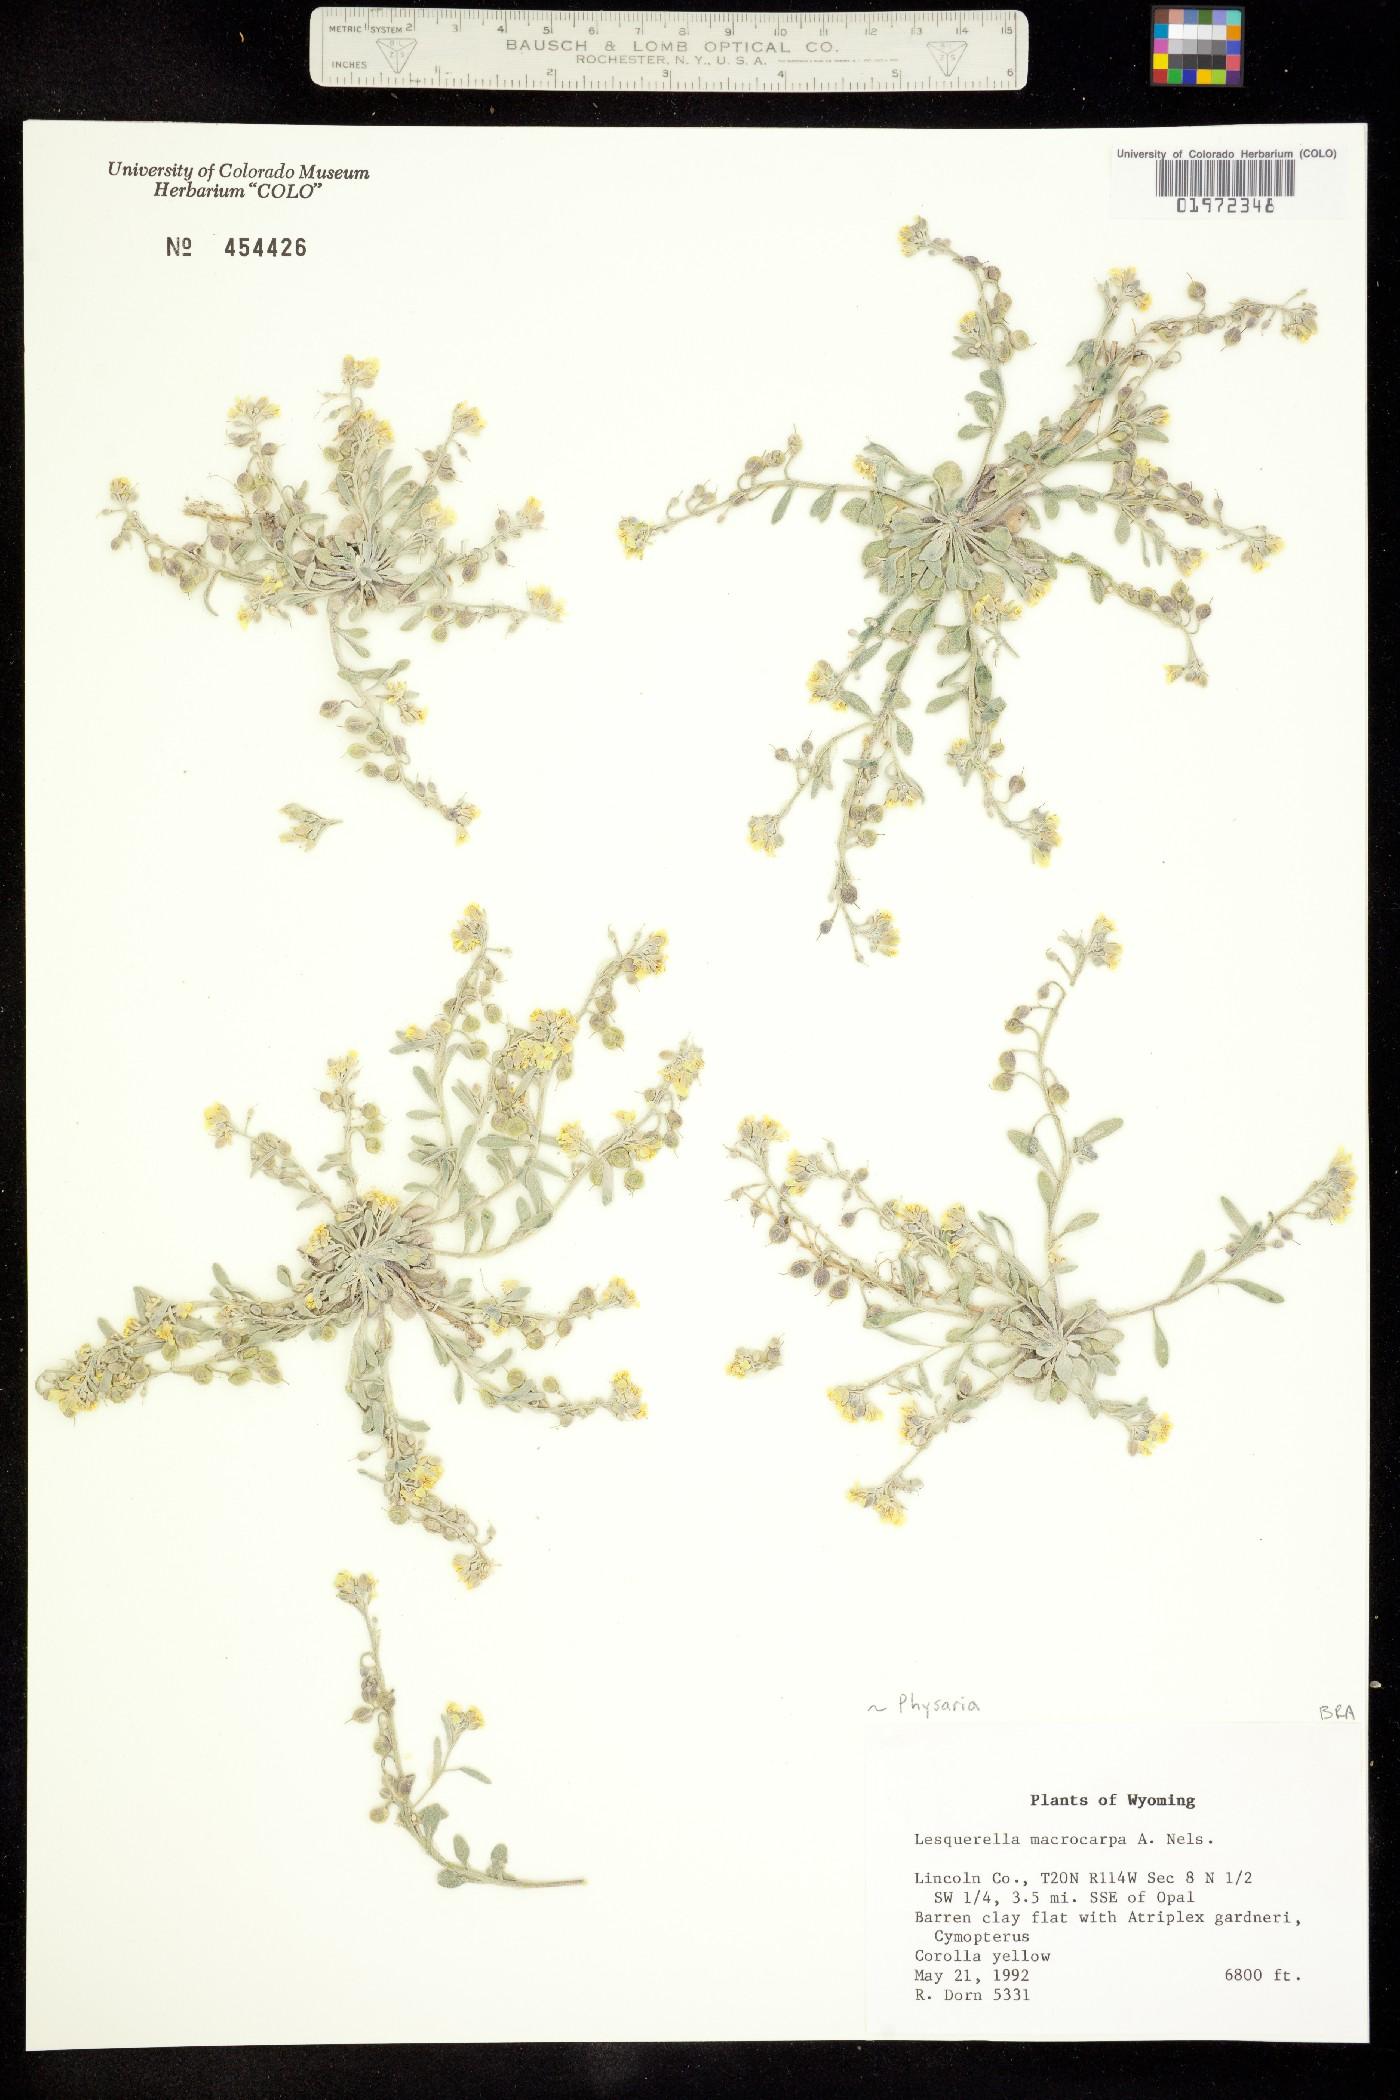 Physaria macrocarpa image